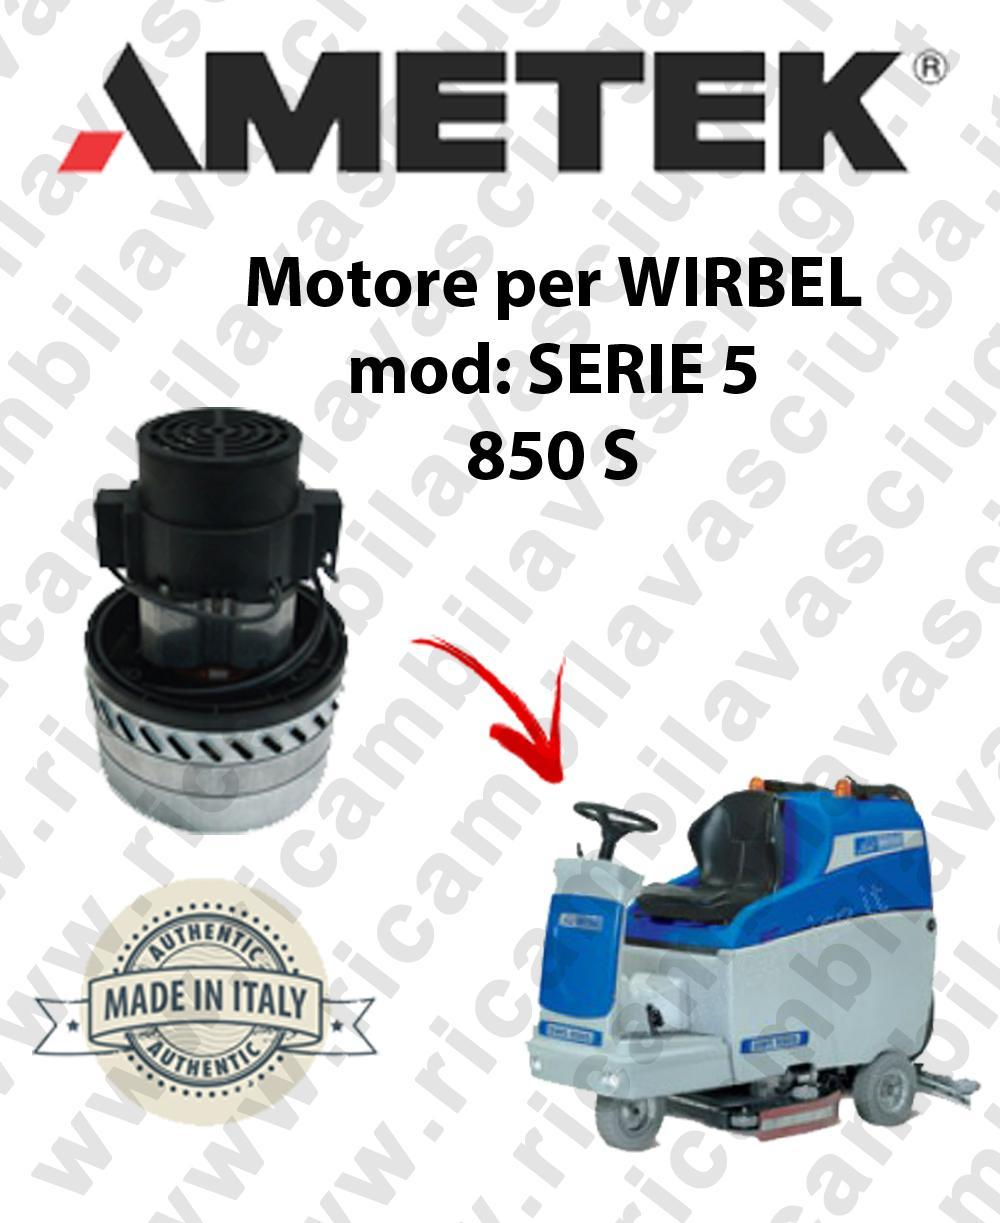 SERIE 5 850 S Motore de aspiración AMETEK para fregadora WIRBEL